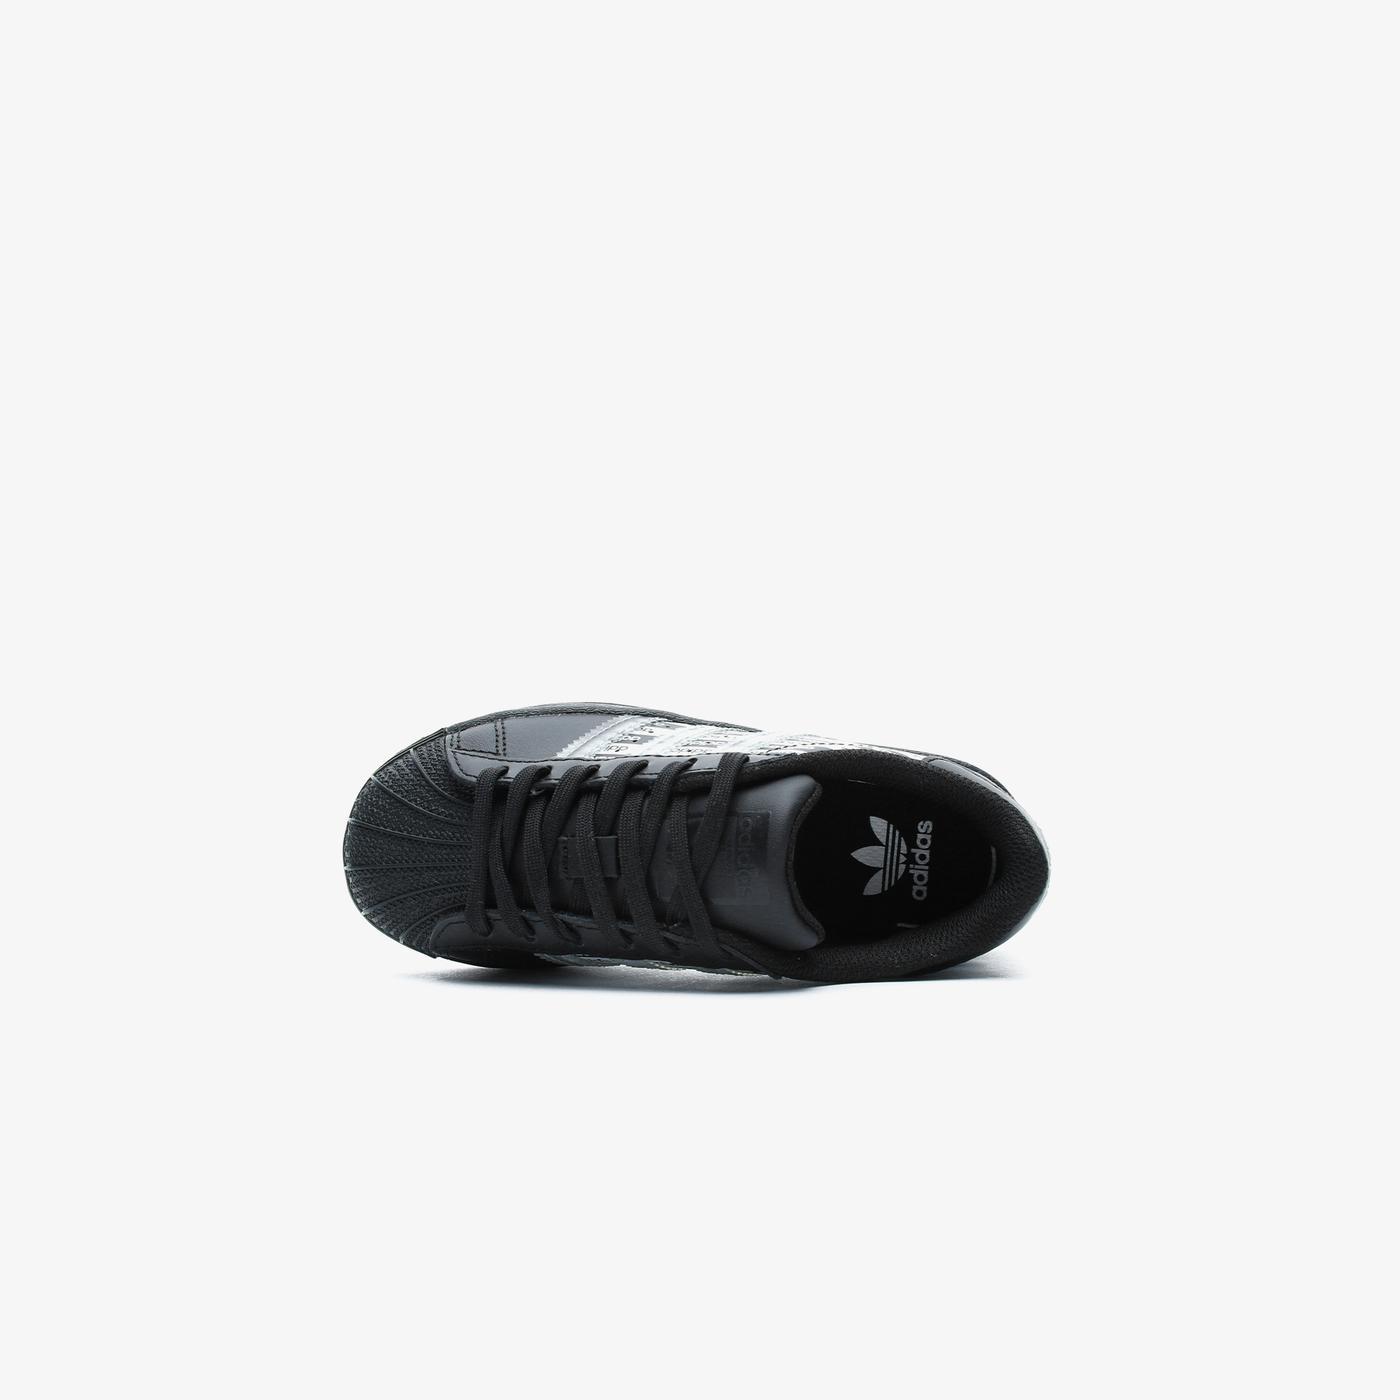 adidas Superstar Çocuk Siyah Spor Ayakkabı